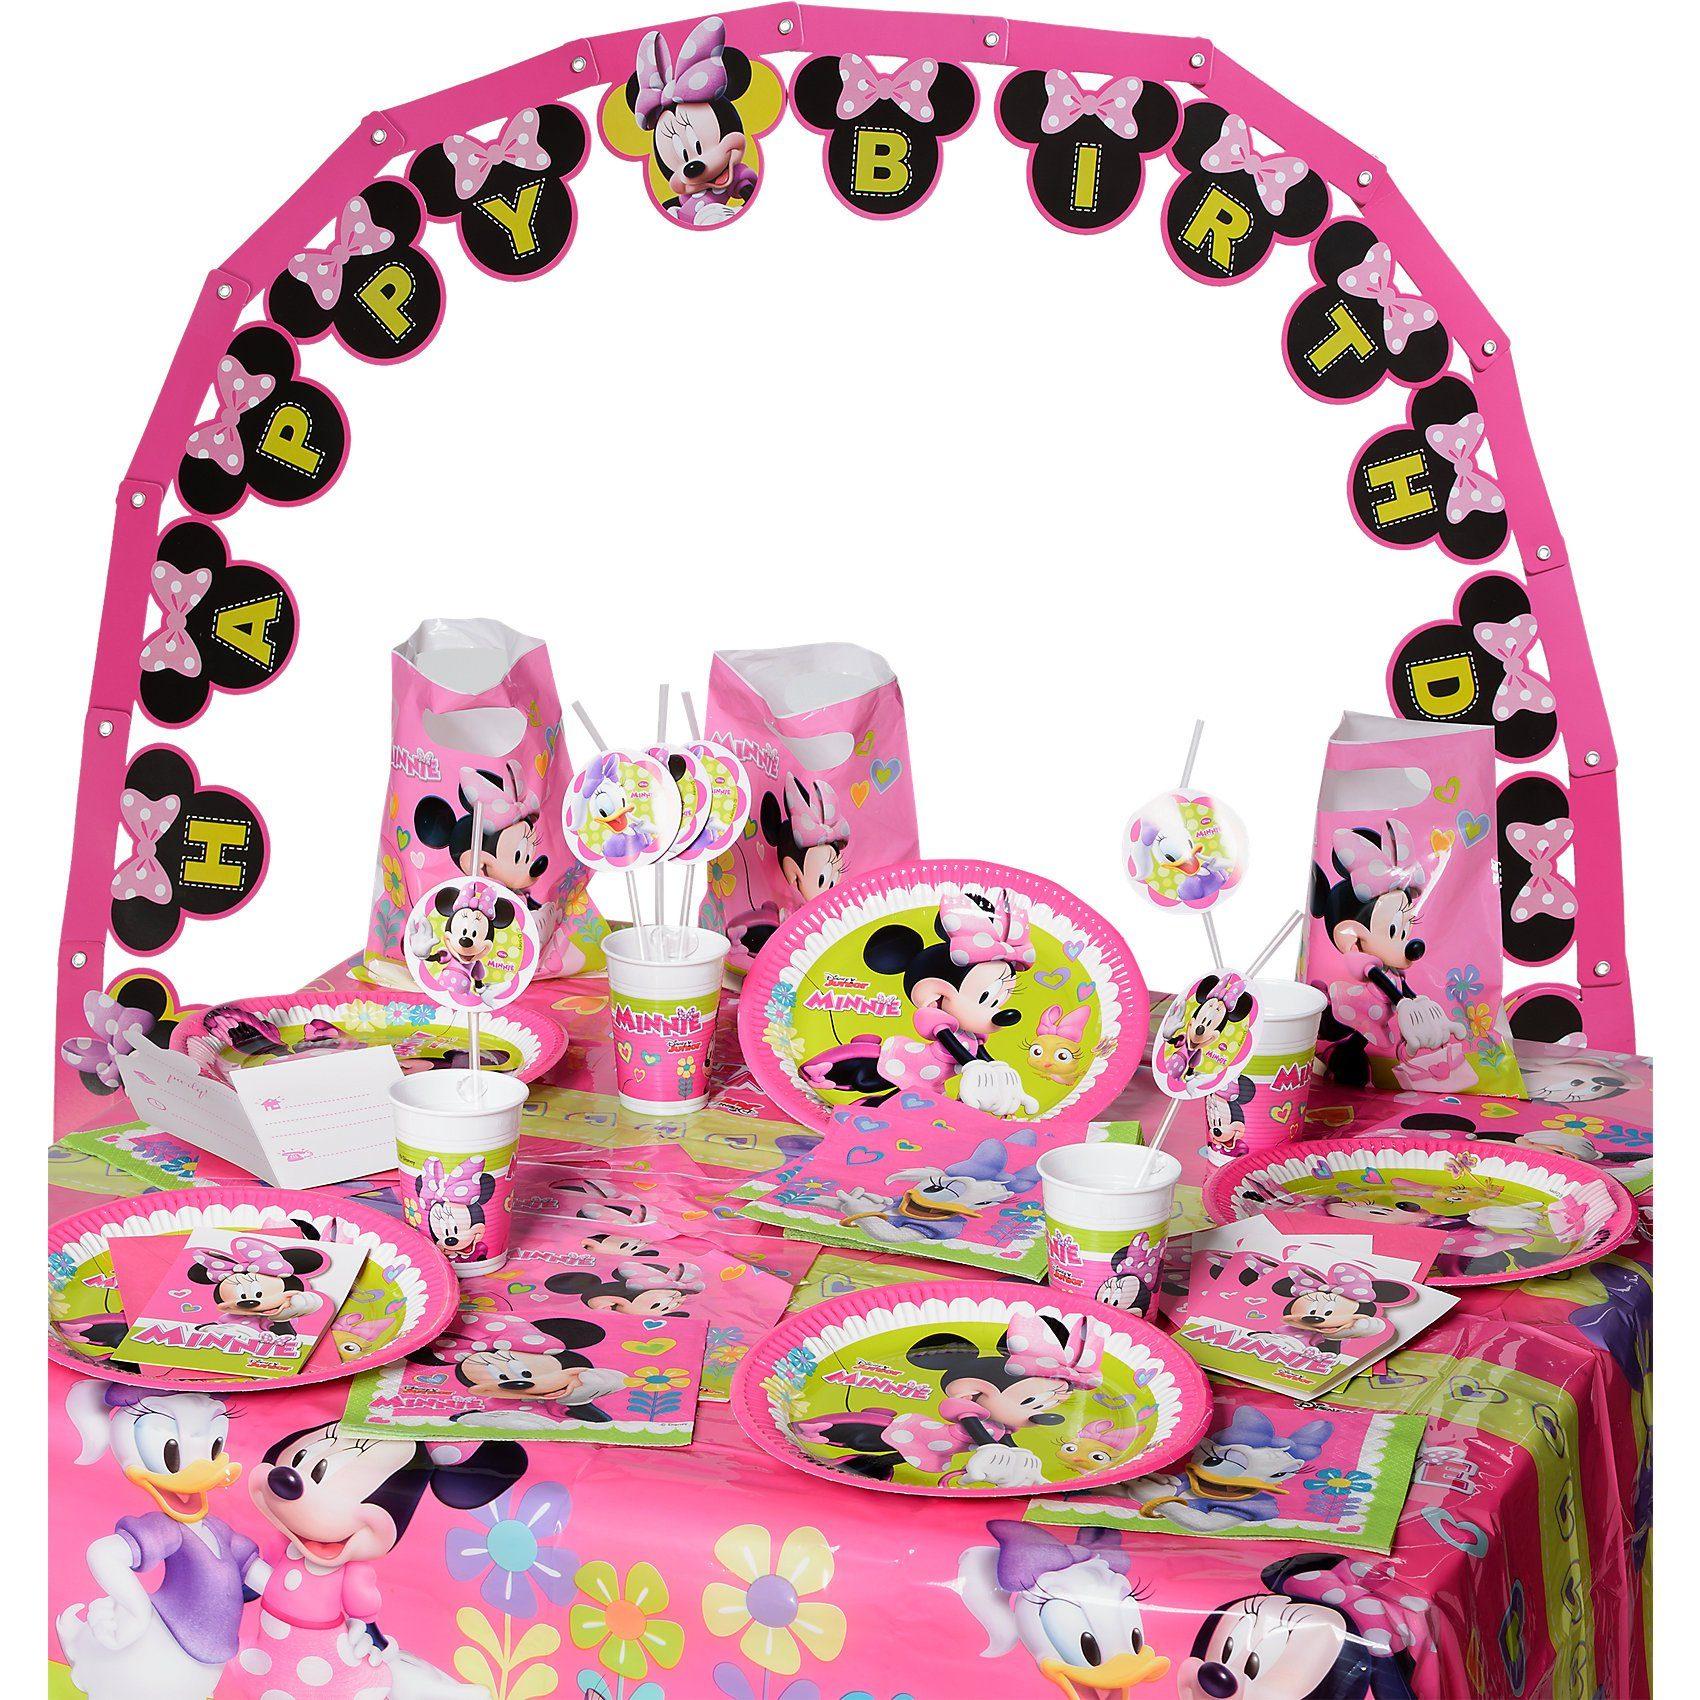 Procos Partyset Minnie Happy Helpers, 56-tlg.